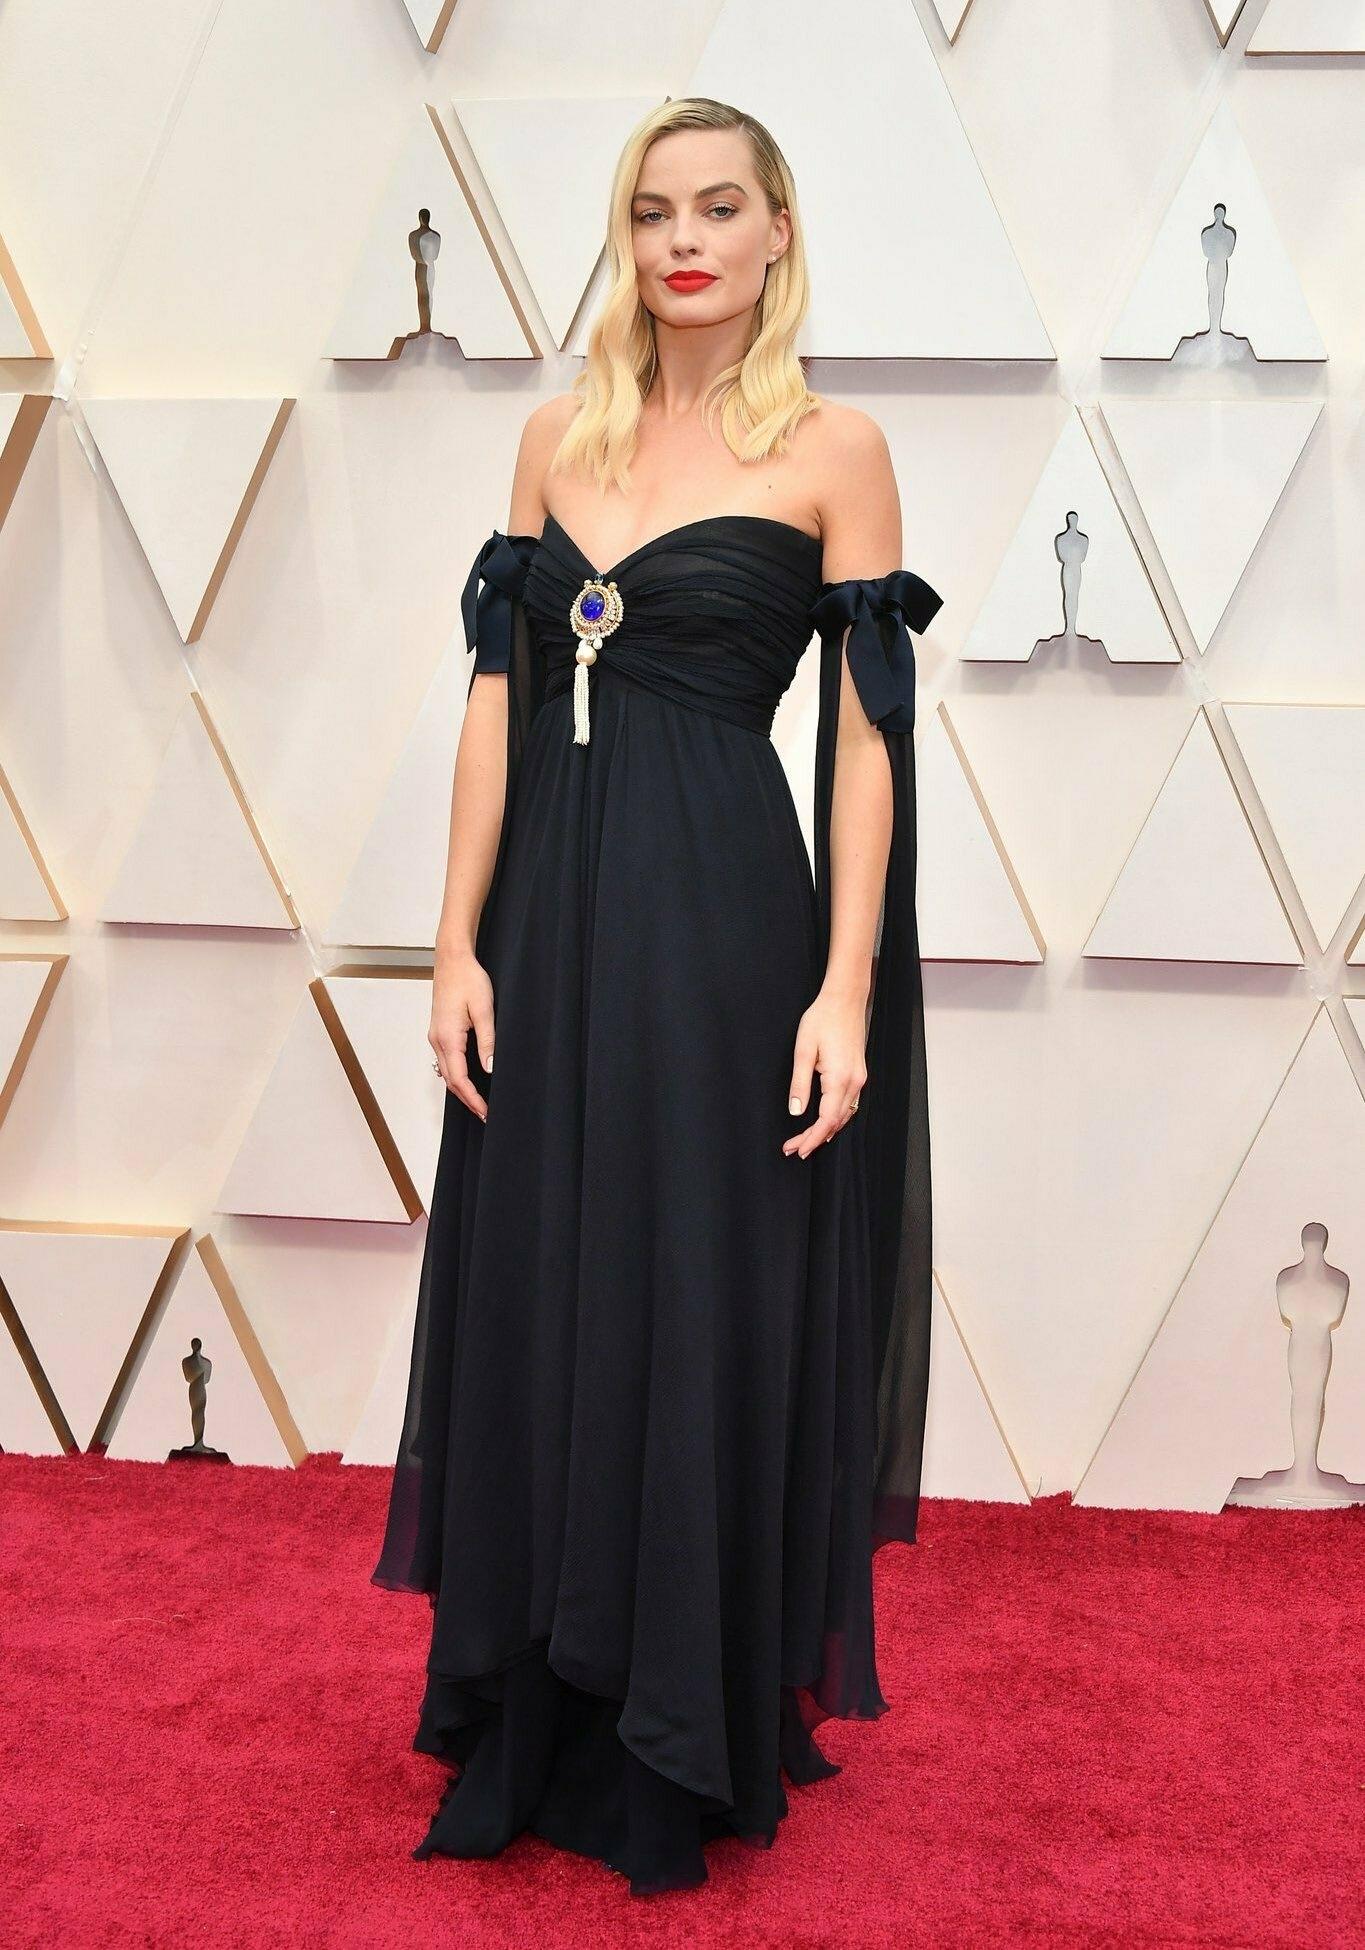 thảm đỏ oscar 2020 Margot Robbie đầm vintage Chanel couture